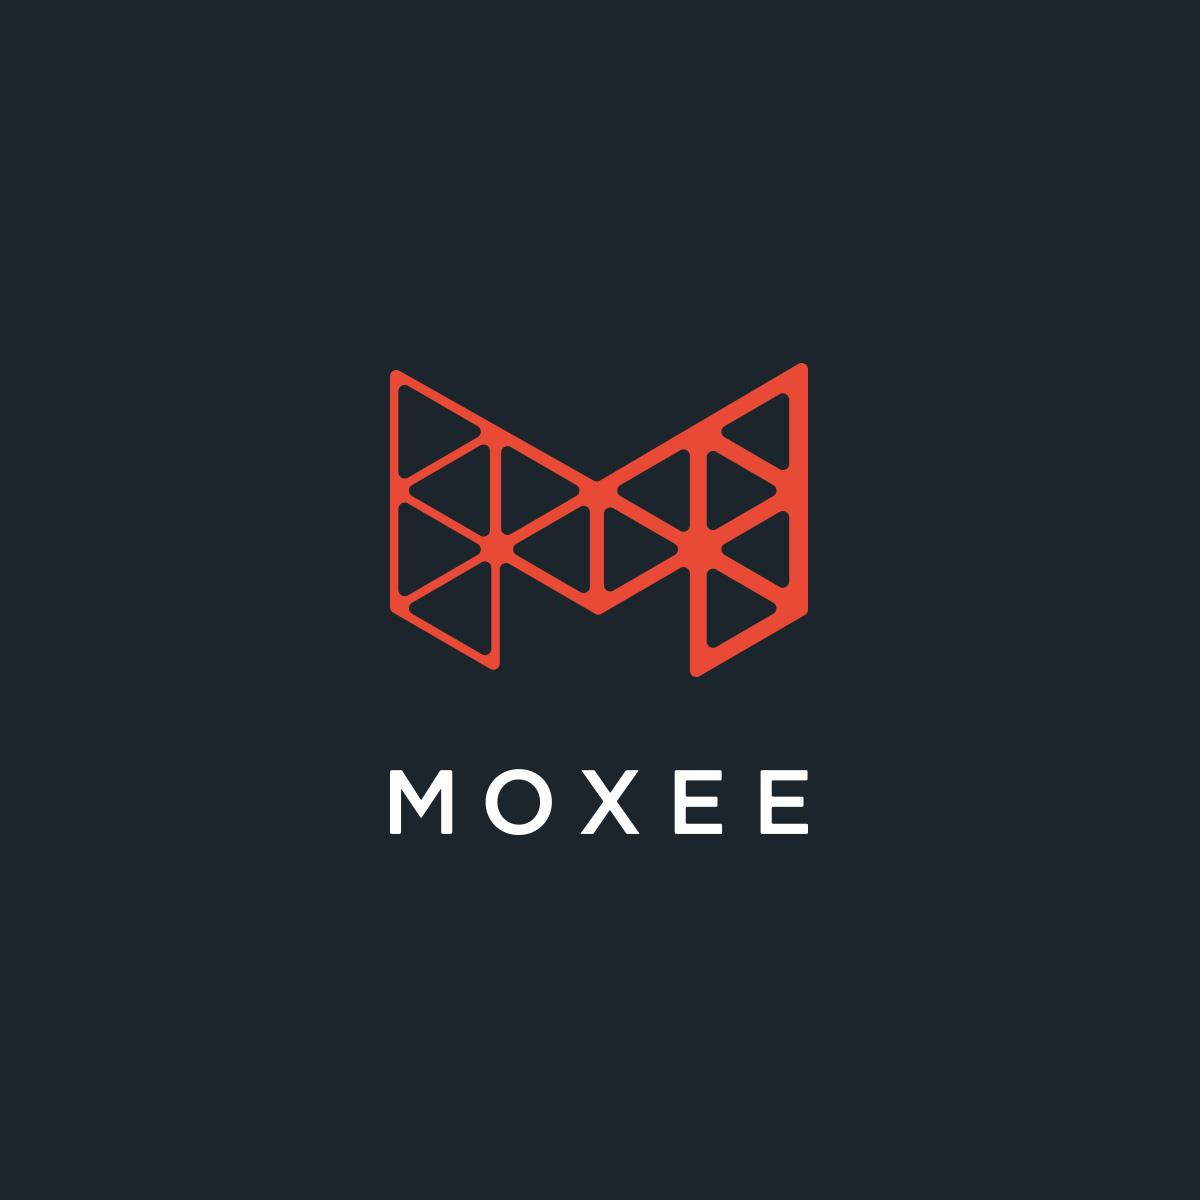 Moxee_logo.jpg